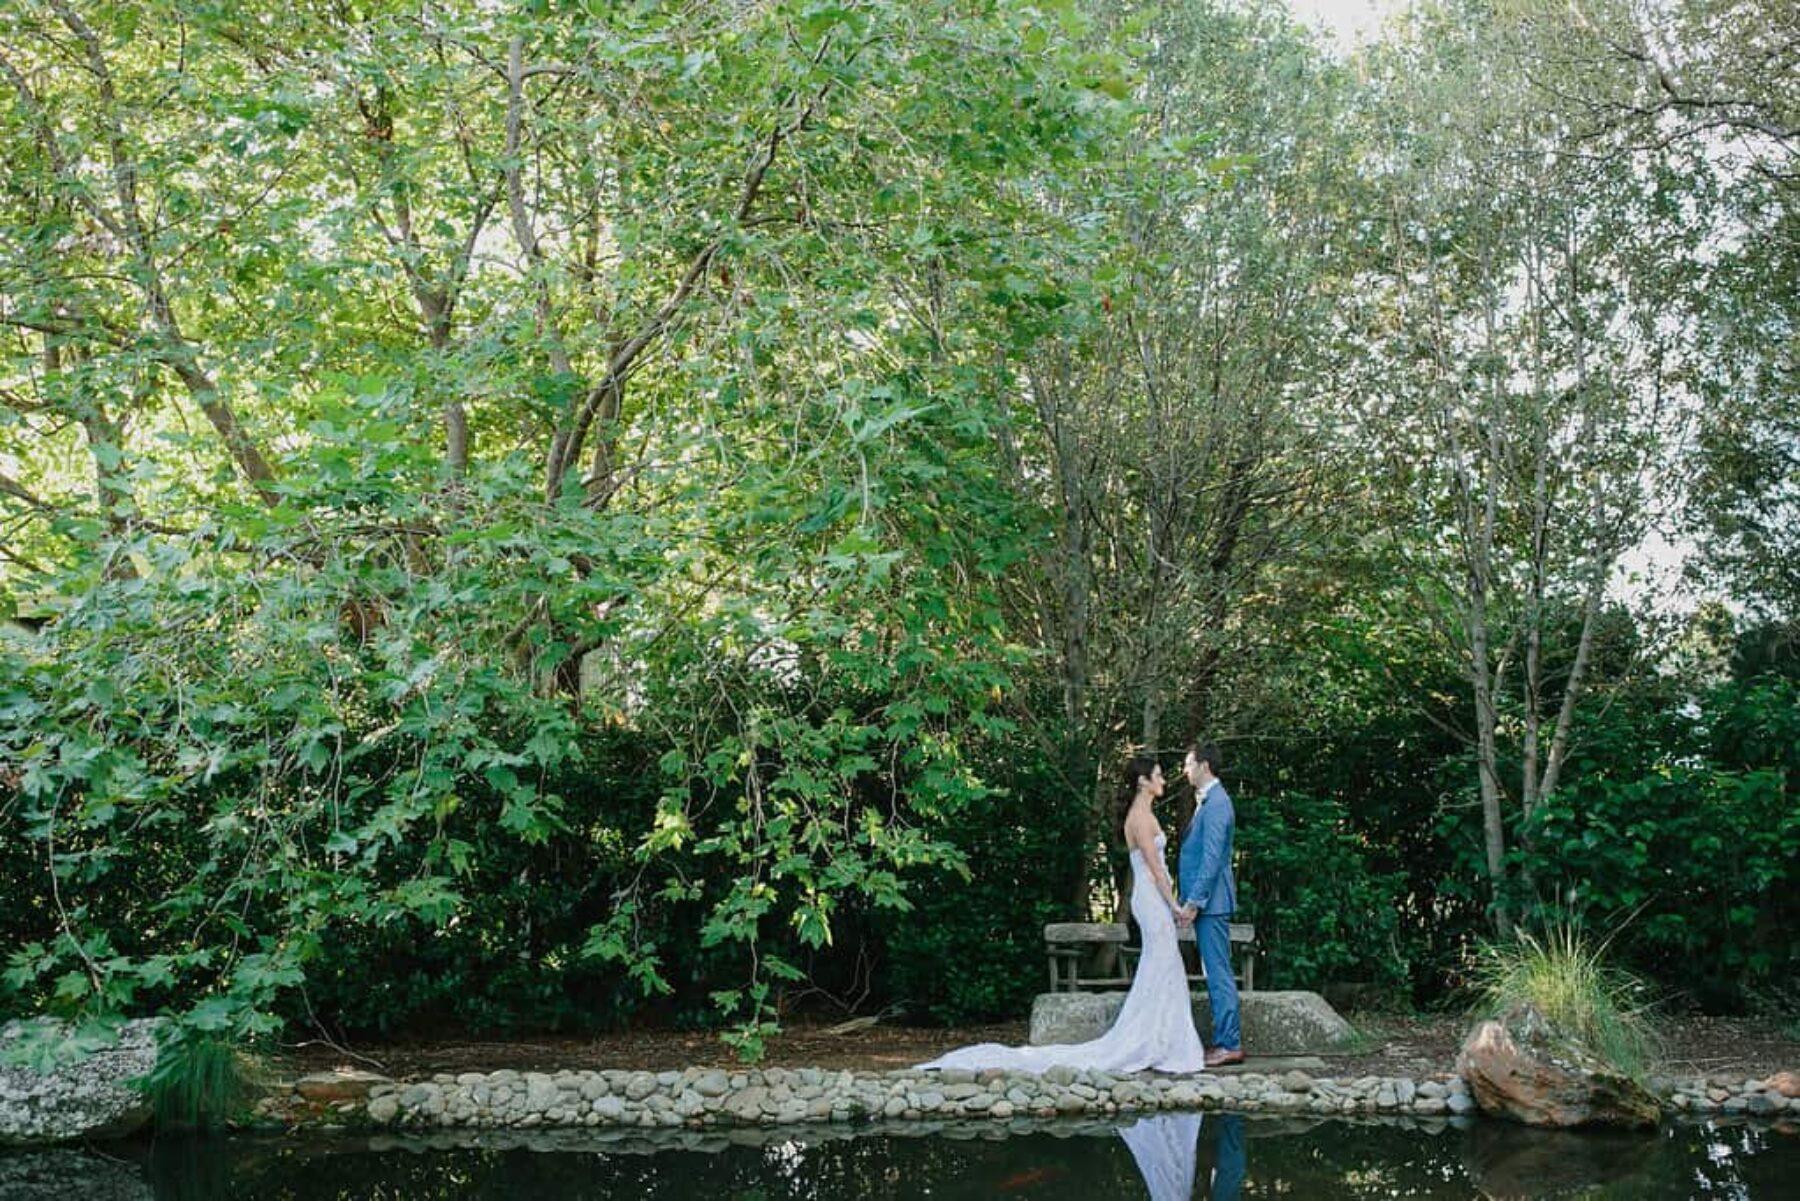 modern luxe Jewish wedding at Bells at Killcare - photography by John Benavente